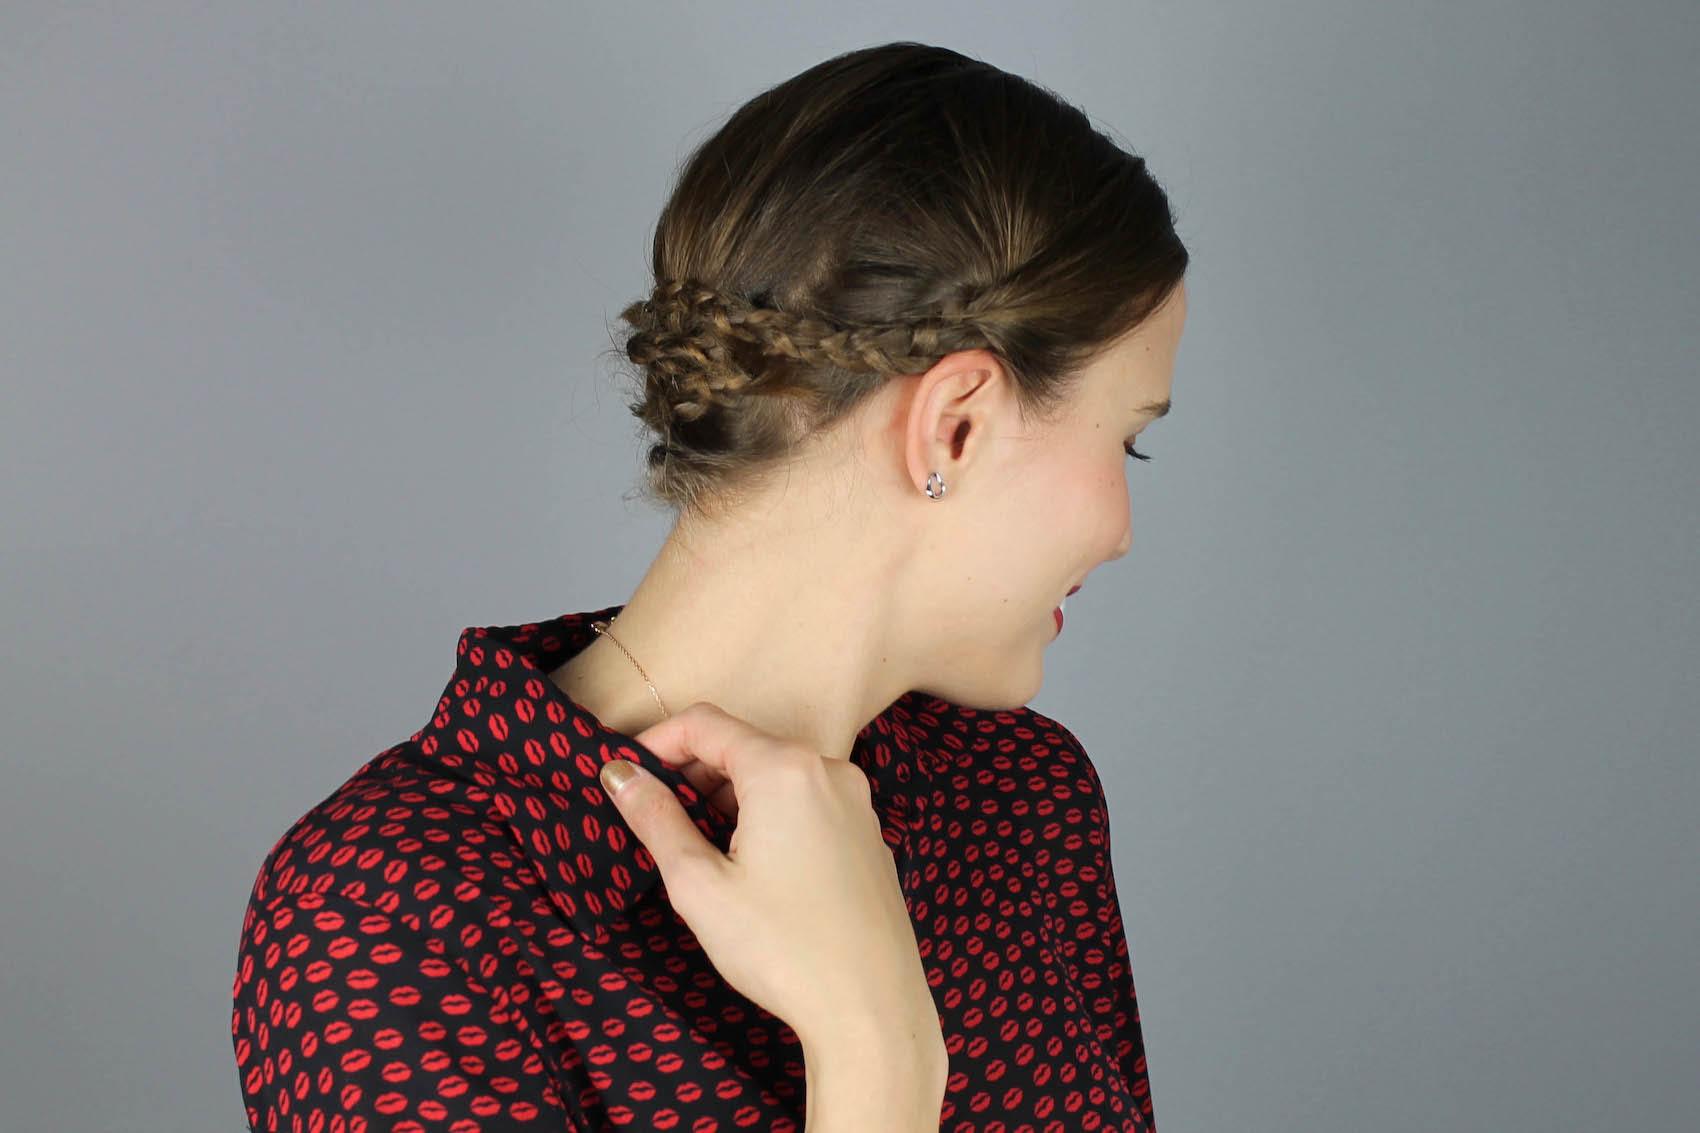 4_3_Suelovesnyc_Silvester_frisuren_styles_newyears_hairstyles_hairstyling_taft_schwarzkopf_susan_fengler_aufmacher_flechtfrisur_winter